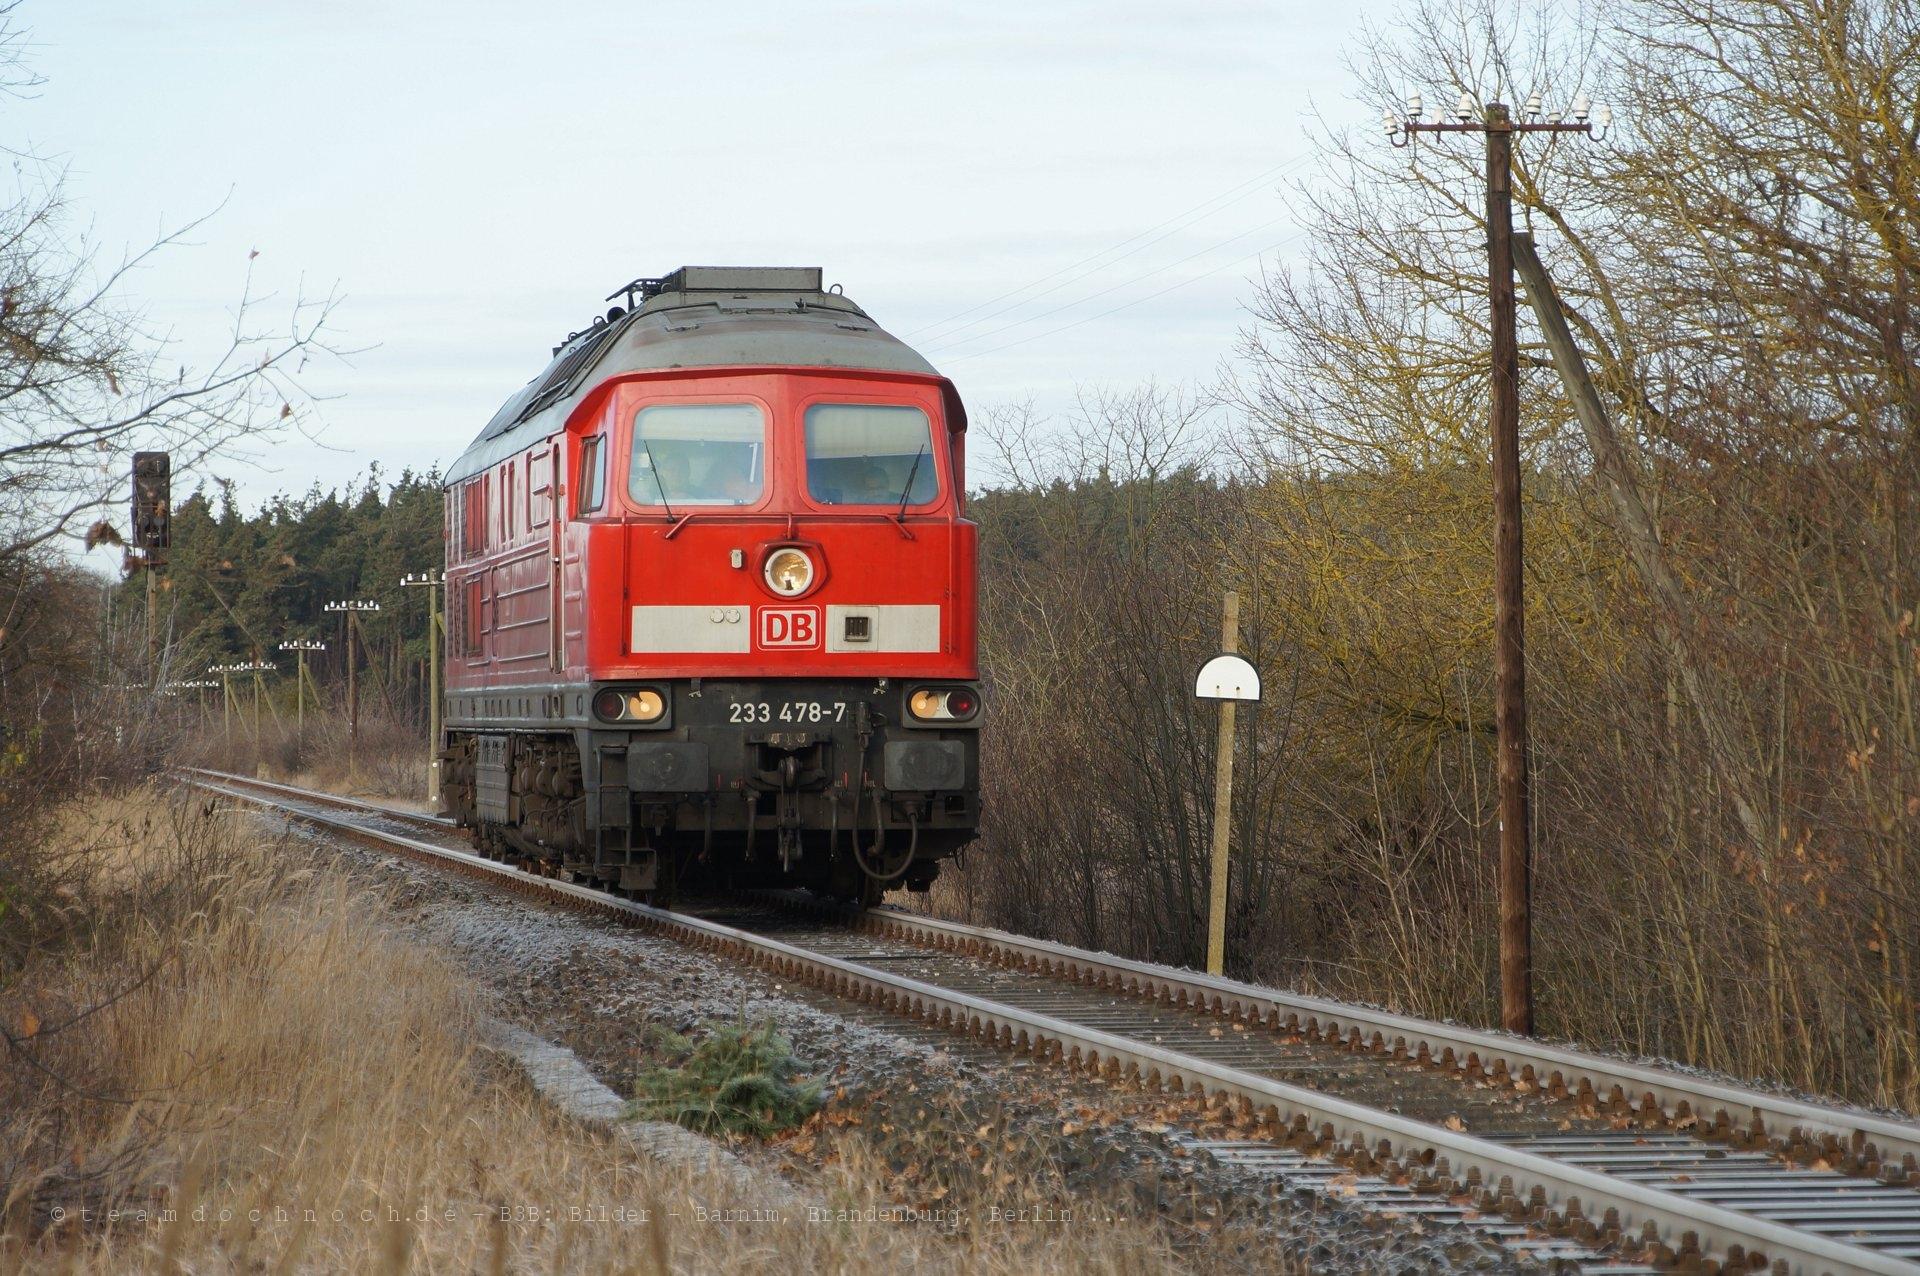 233 478-7 kommt aus Richtung Templin in den Bahnhof Milmersdorf